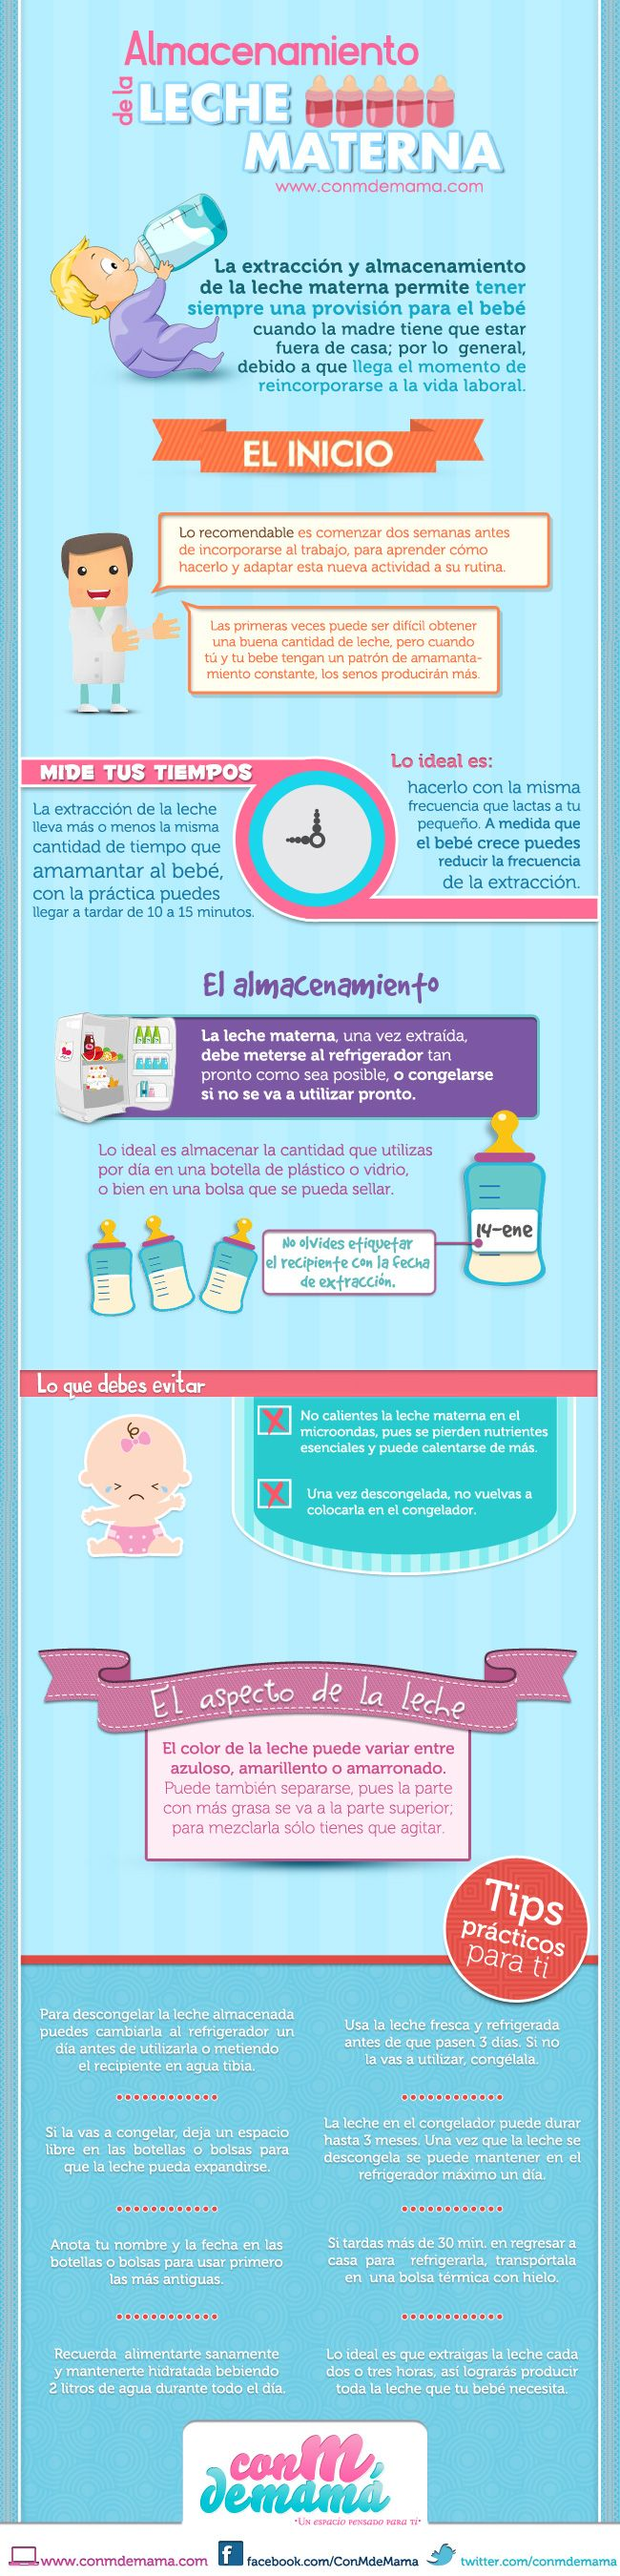 Aprende cómo almacenar correctamente la leche materna #Infografía.